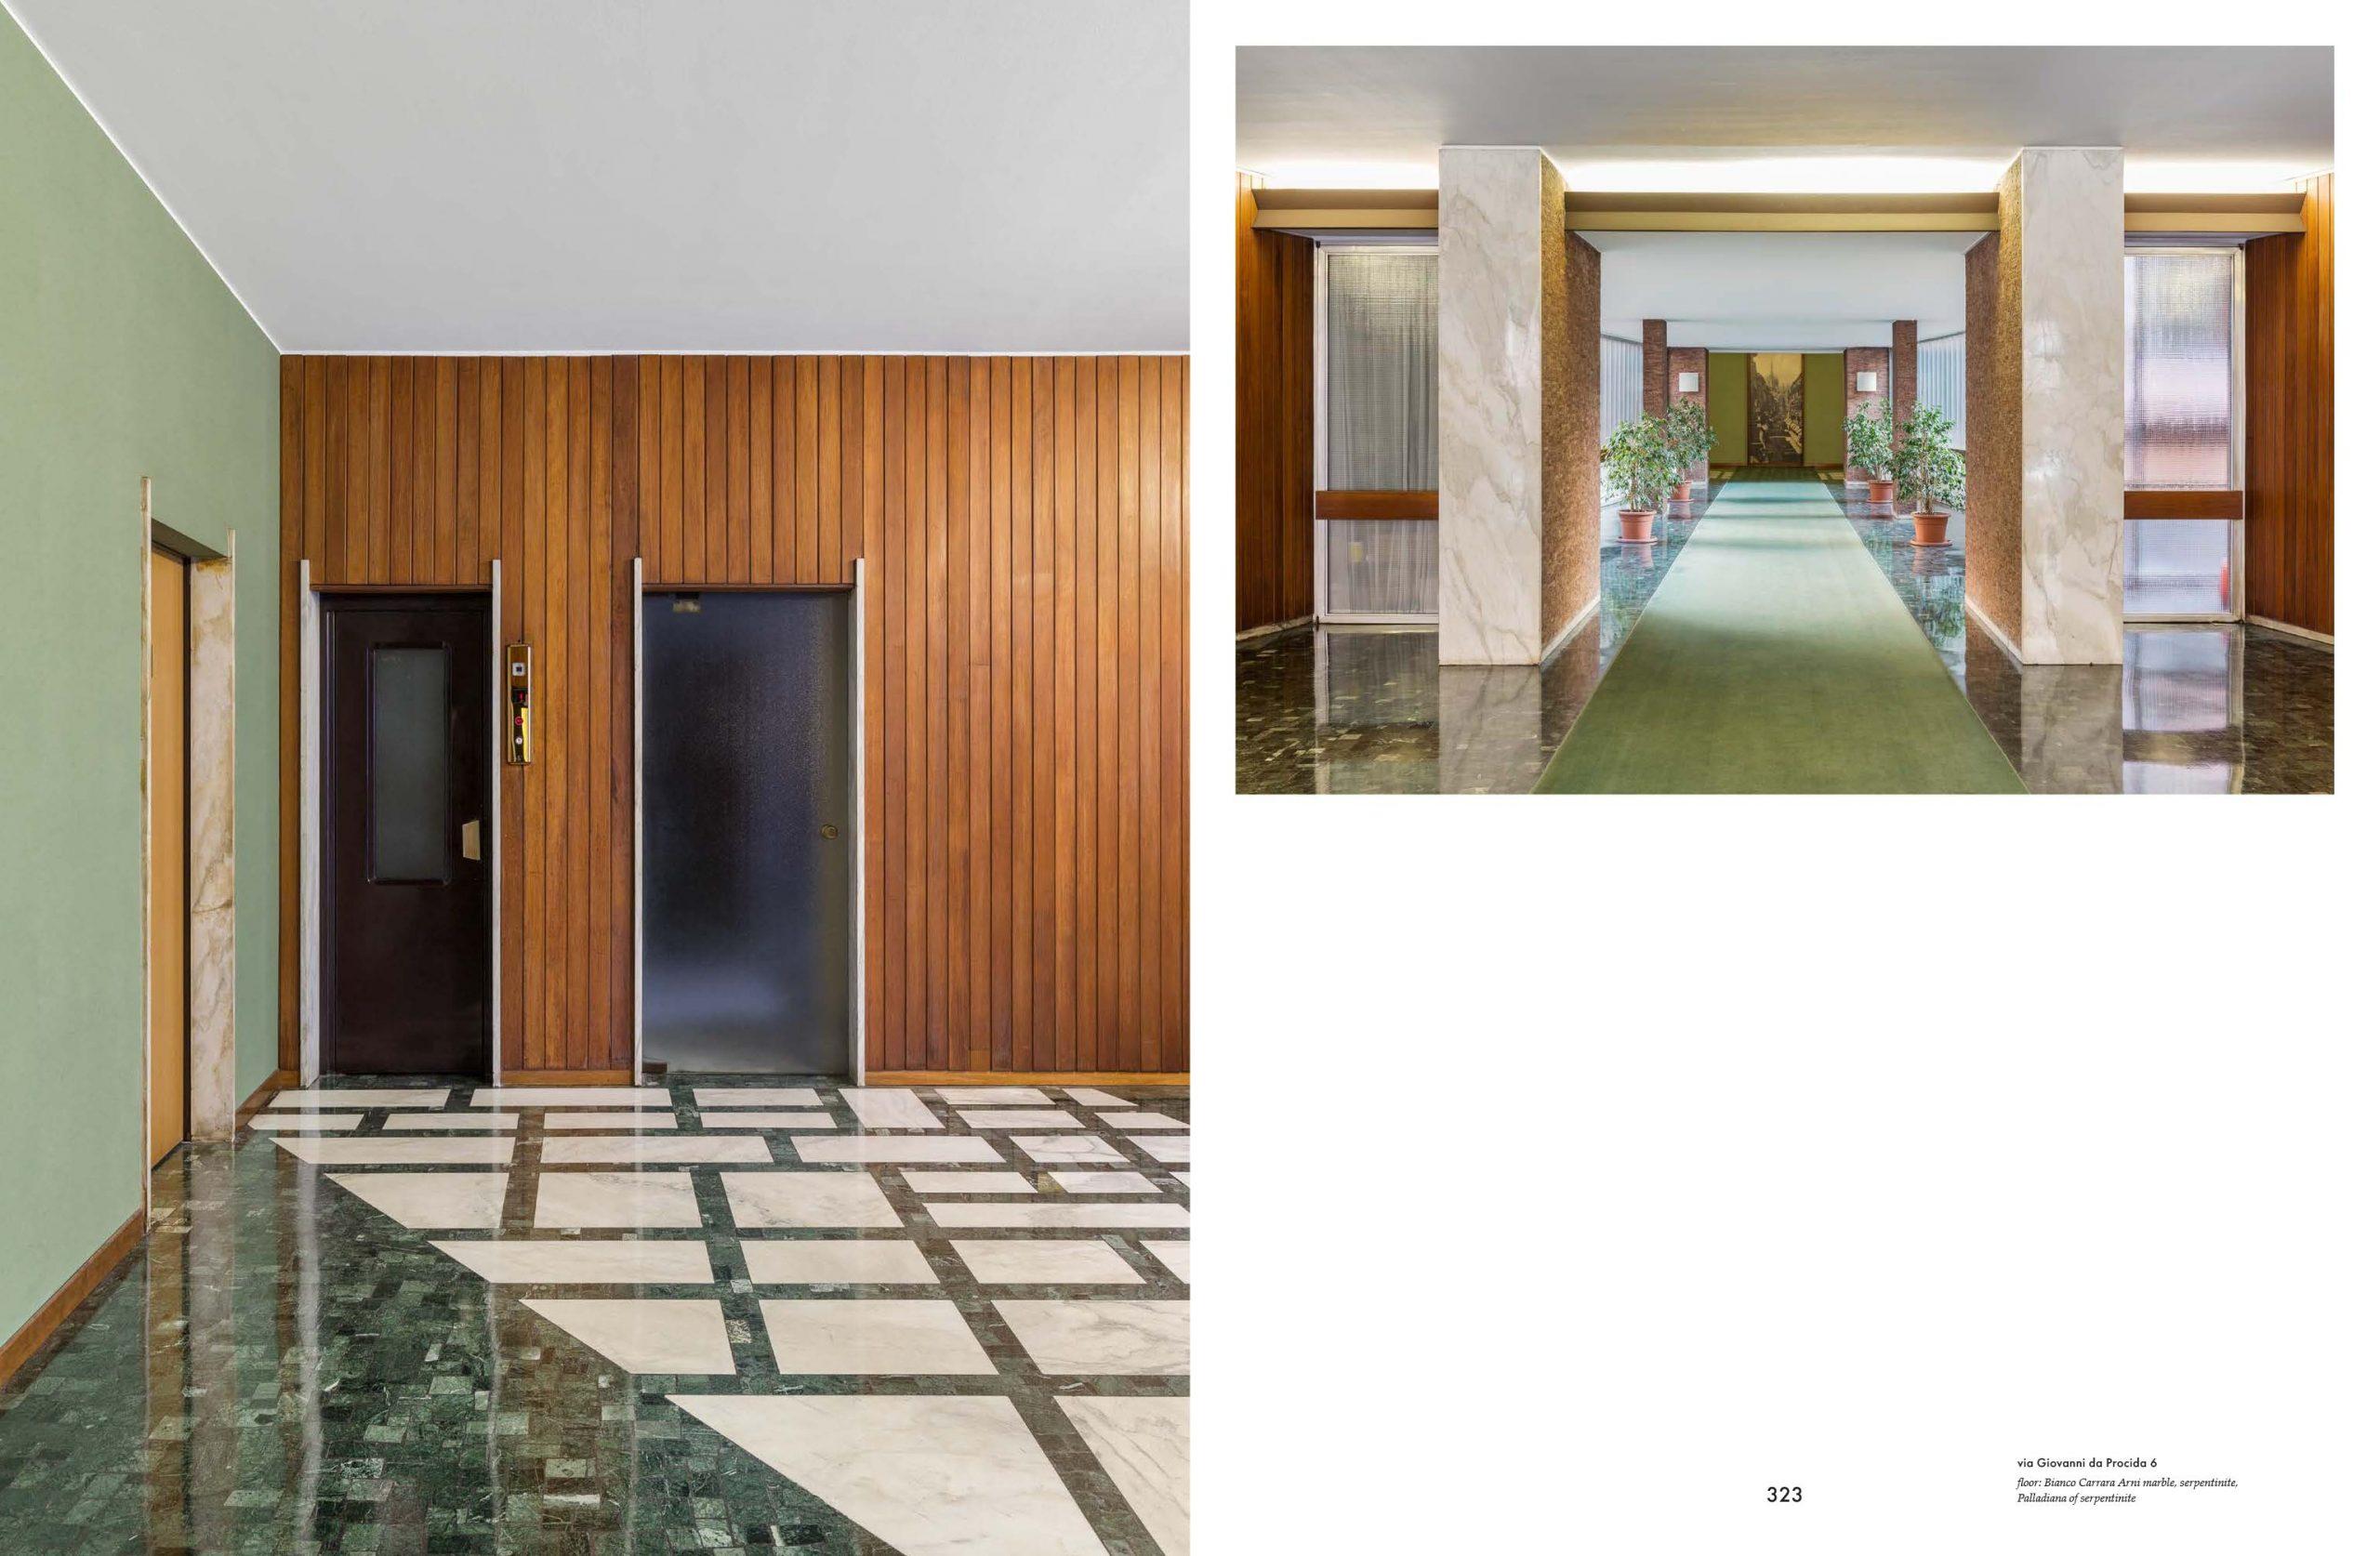 nicoletta-dalfino-karl-kolbitz-entryways-of-milan-taschen-pp322-323-scaled